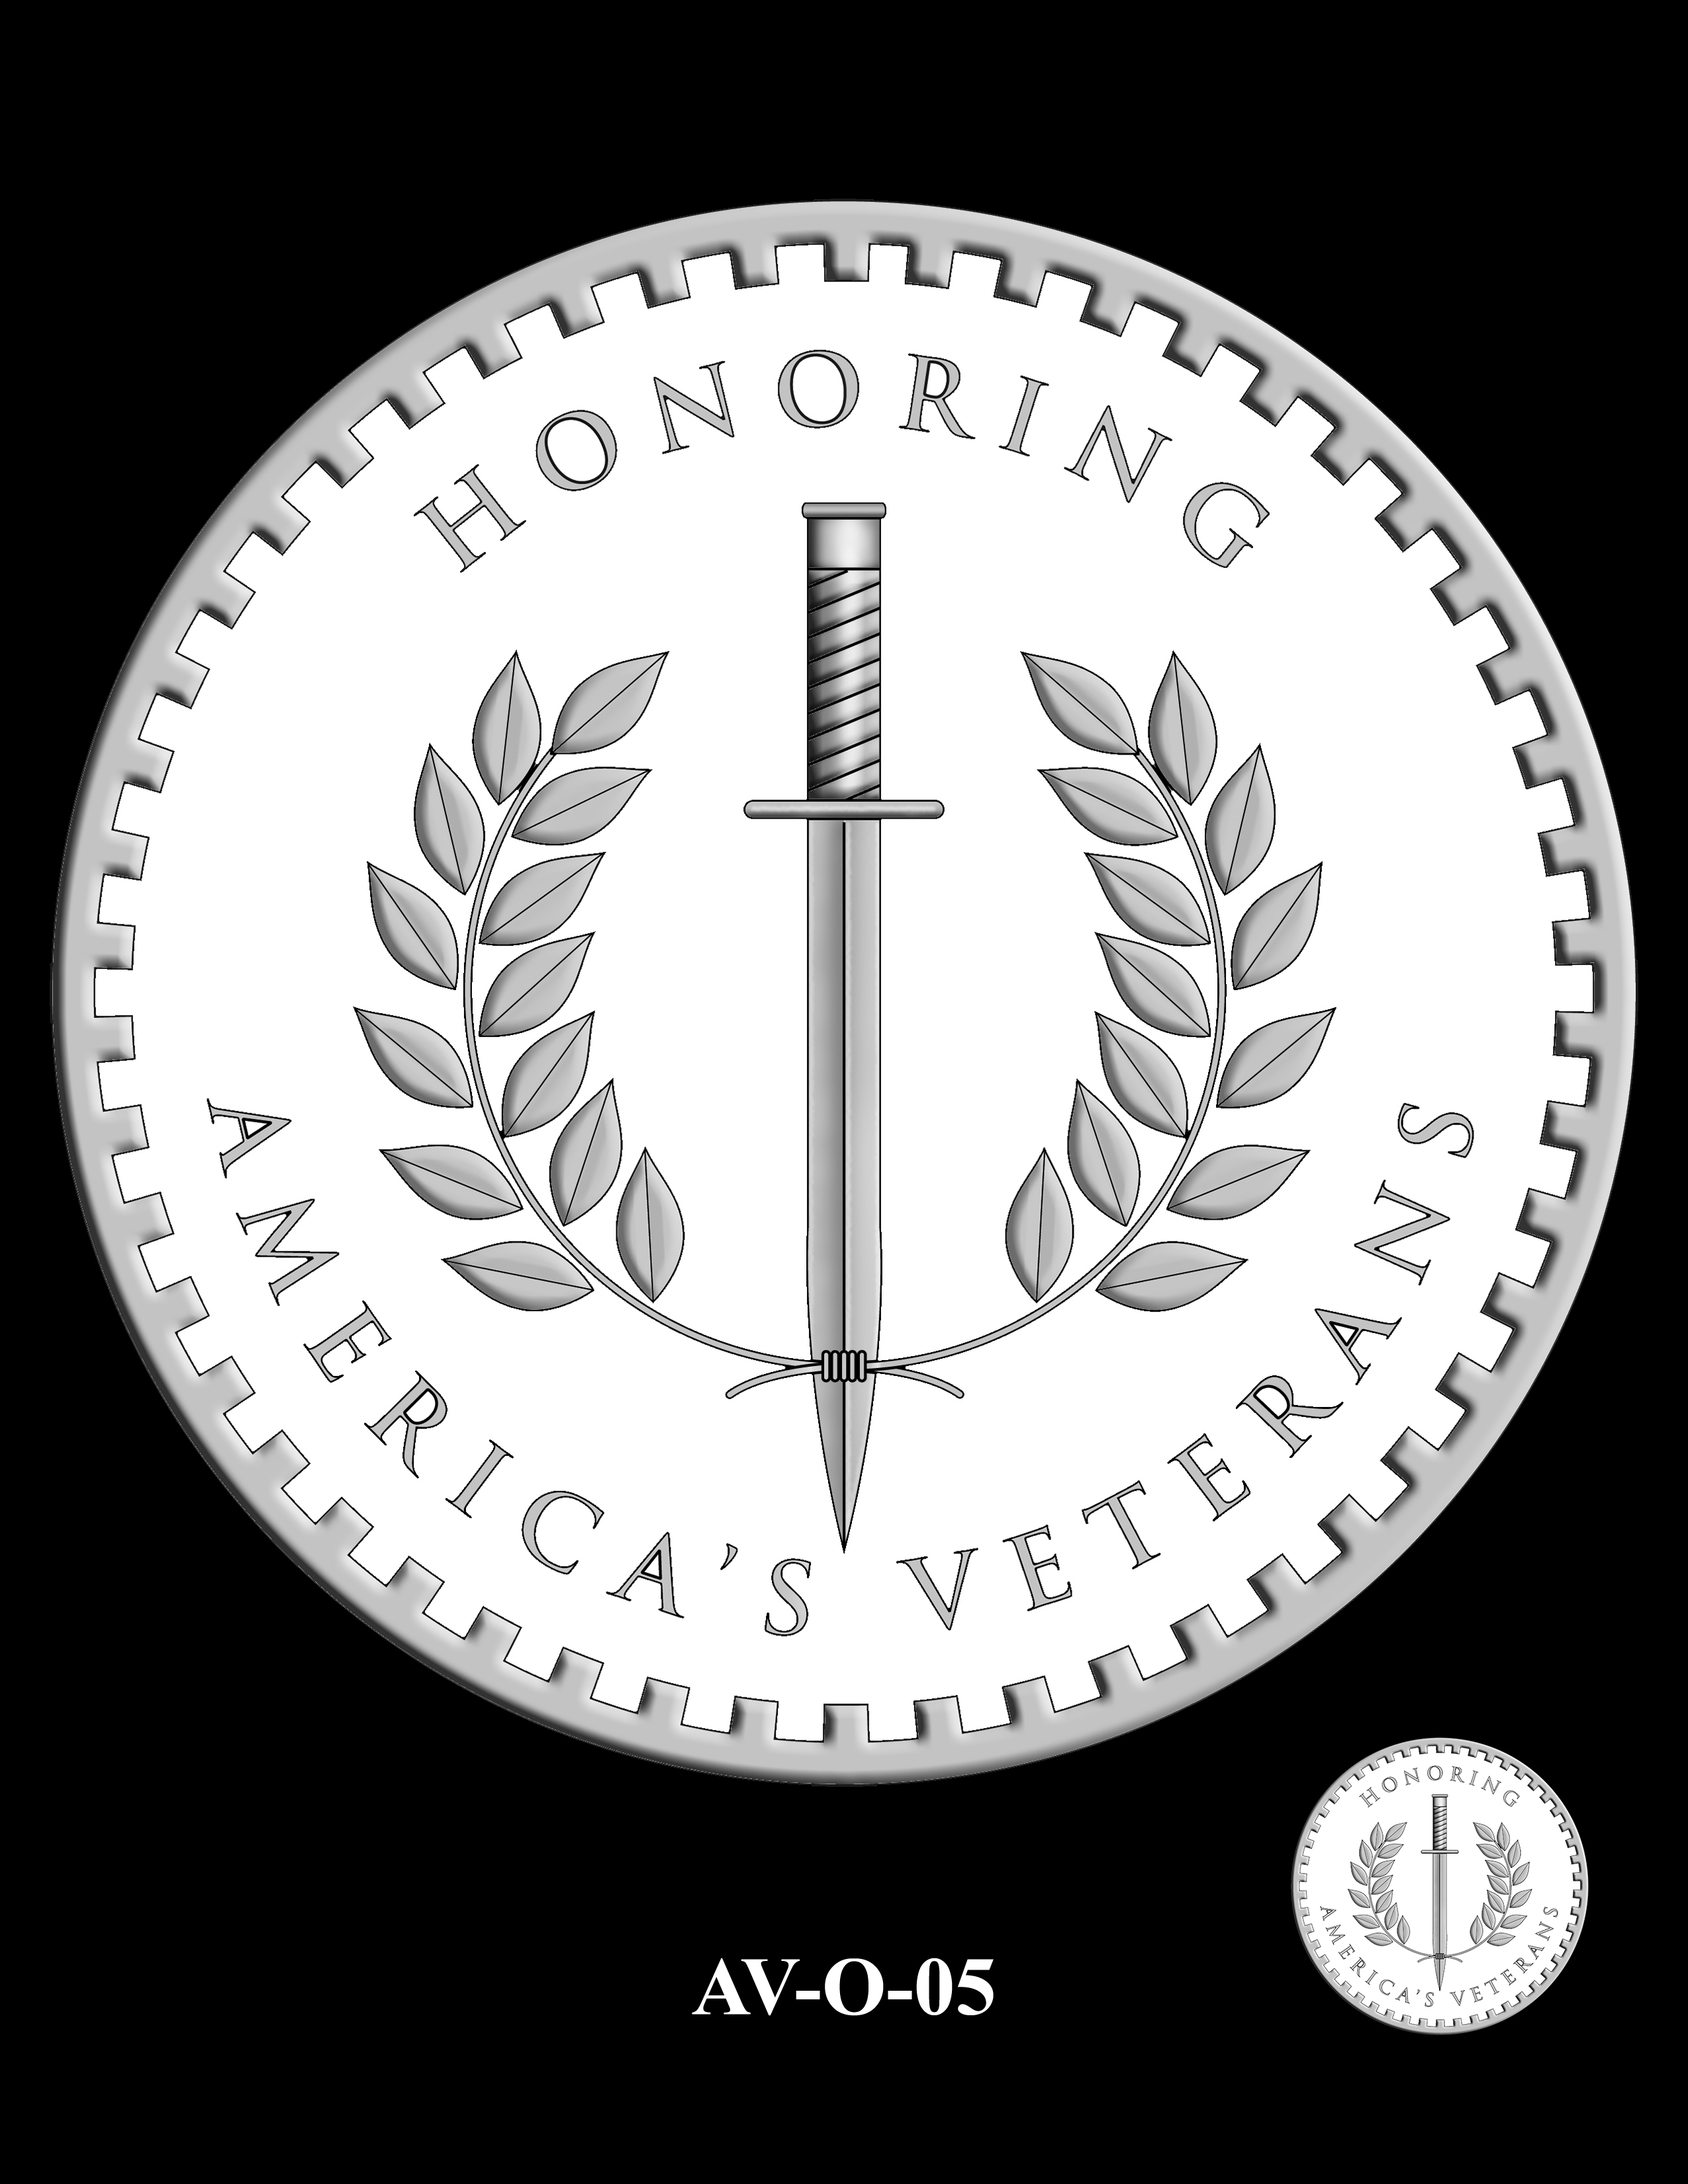 AV-O-05 - American Veterans Medal